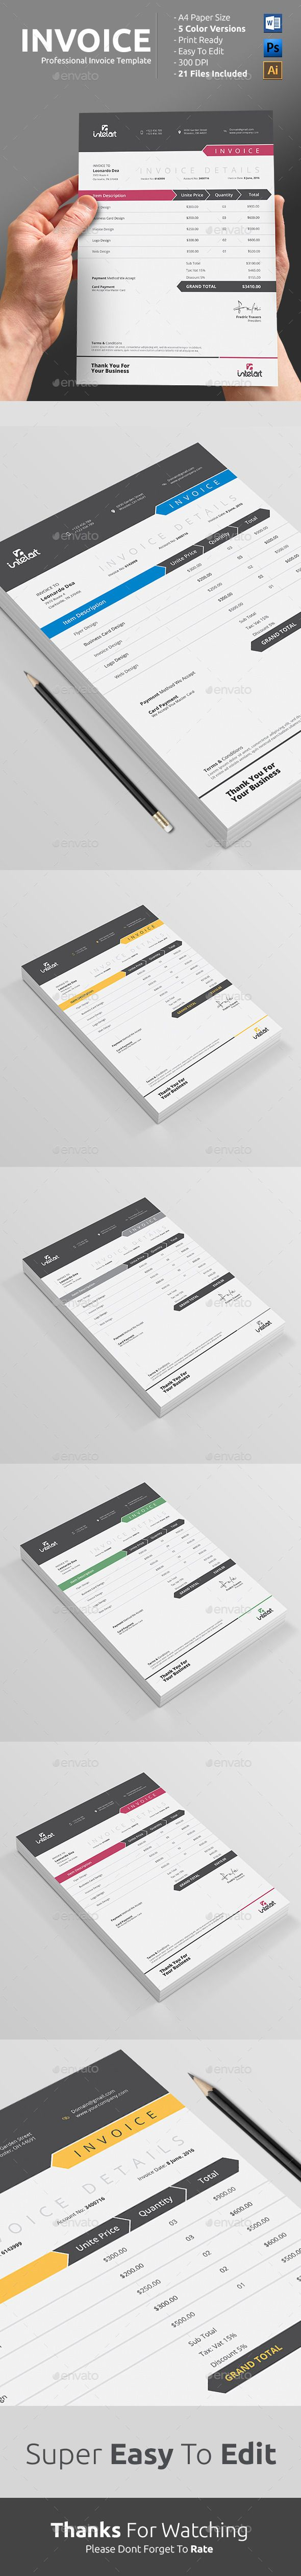 Invoice Template PSD, AI #design Download: http://graphicriver.net/item/invoice/13280533?ref=ksioks